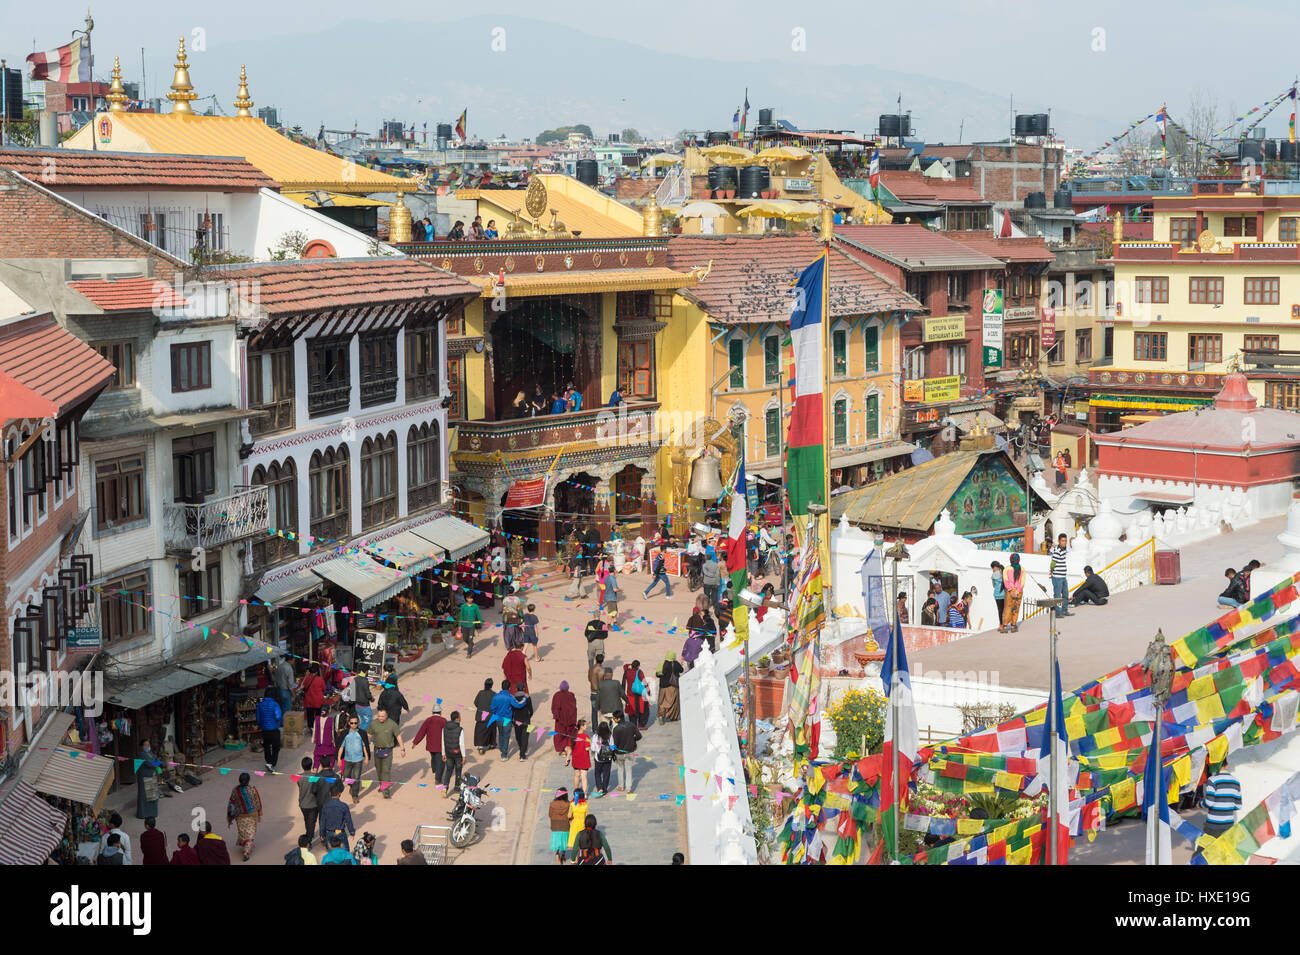 Kathmandu, Nepal - 18 March 2015: People are walking around Boudhanath temple in Kathmandu - Stock Image